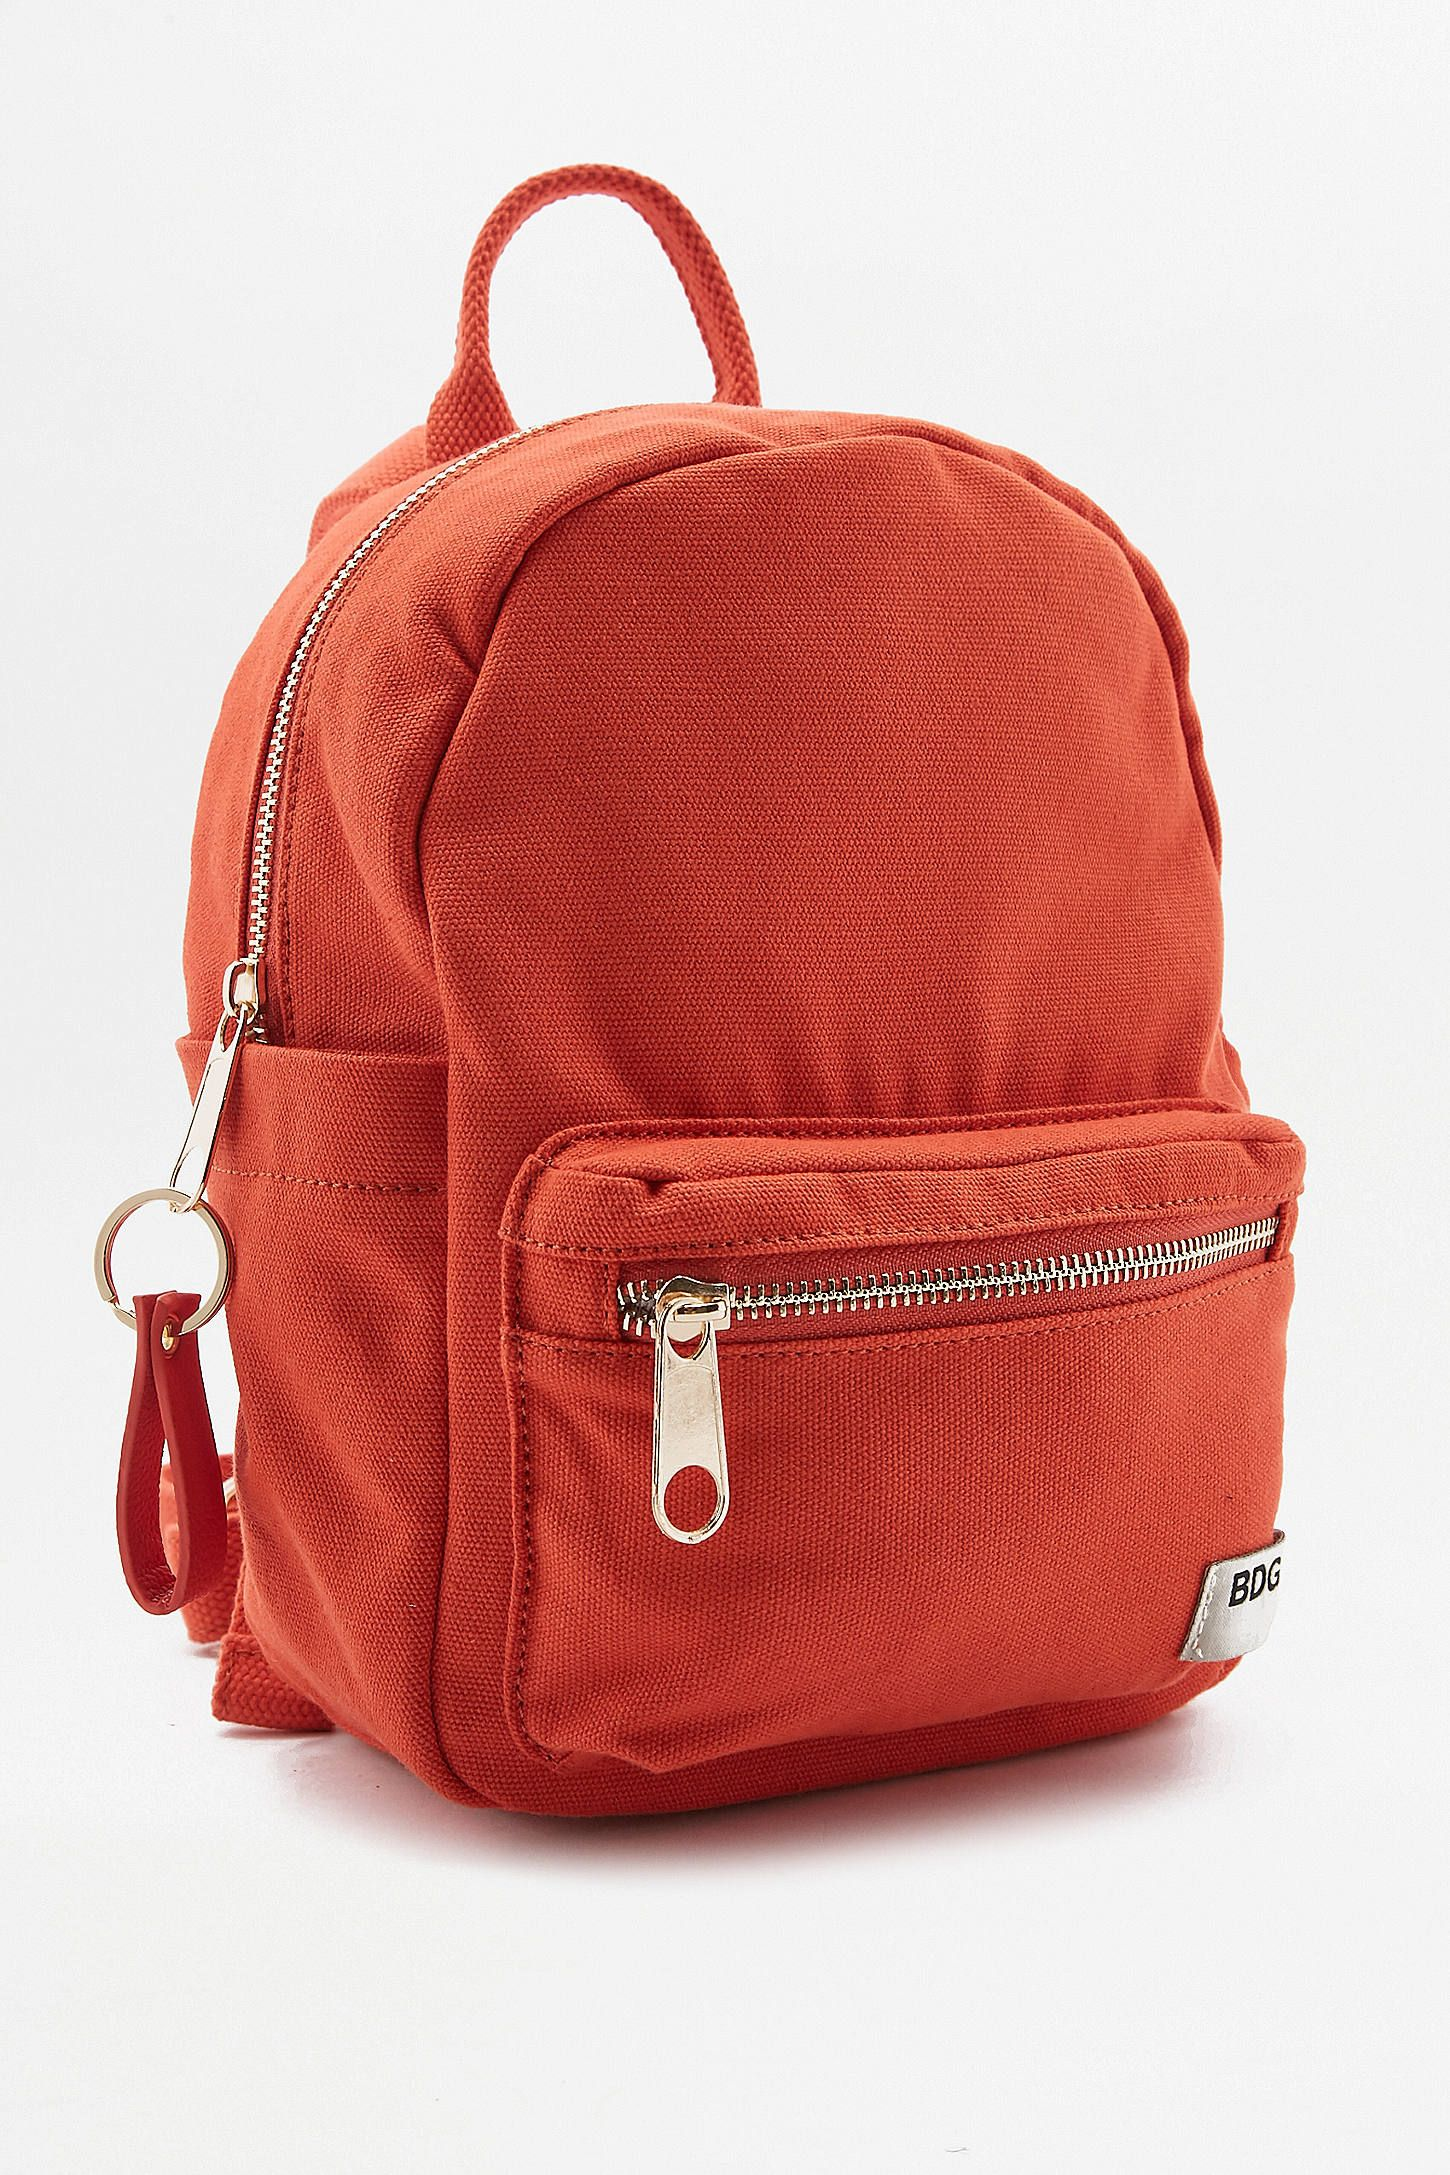 Bdg Canvas Mini Backpack Petit Sac A Dos Petit Sac Sac